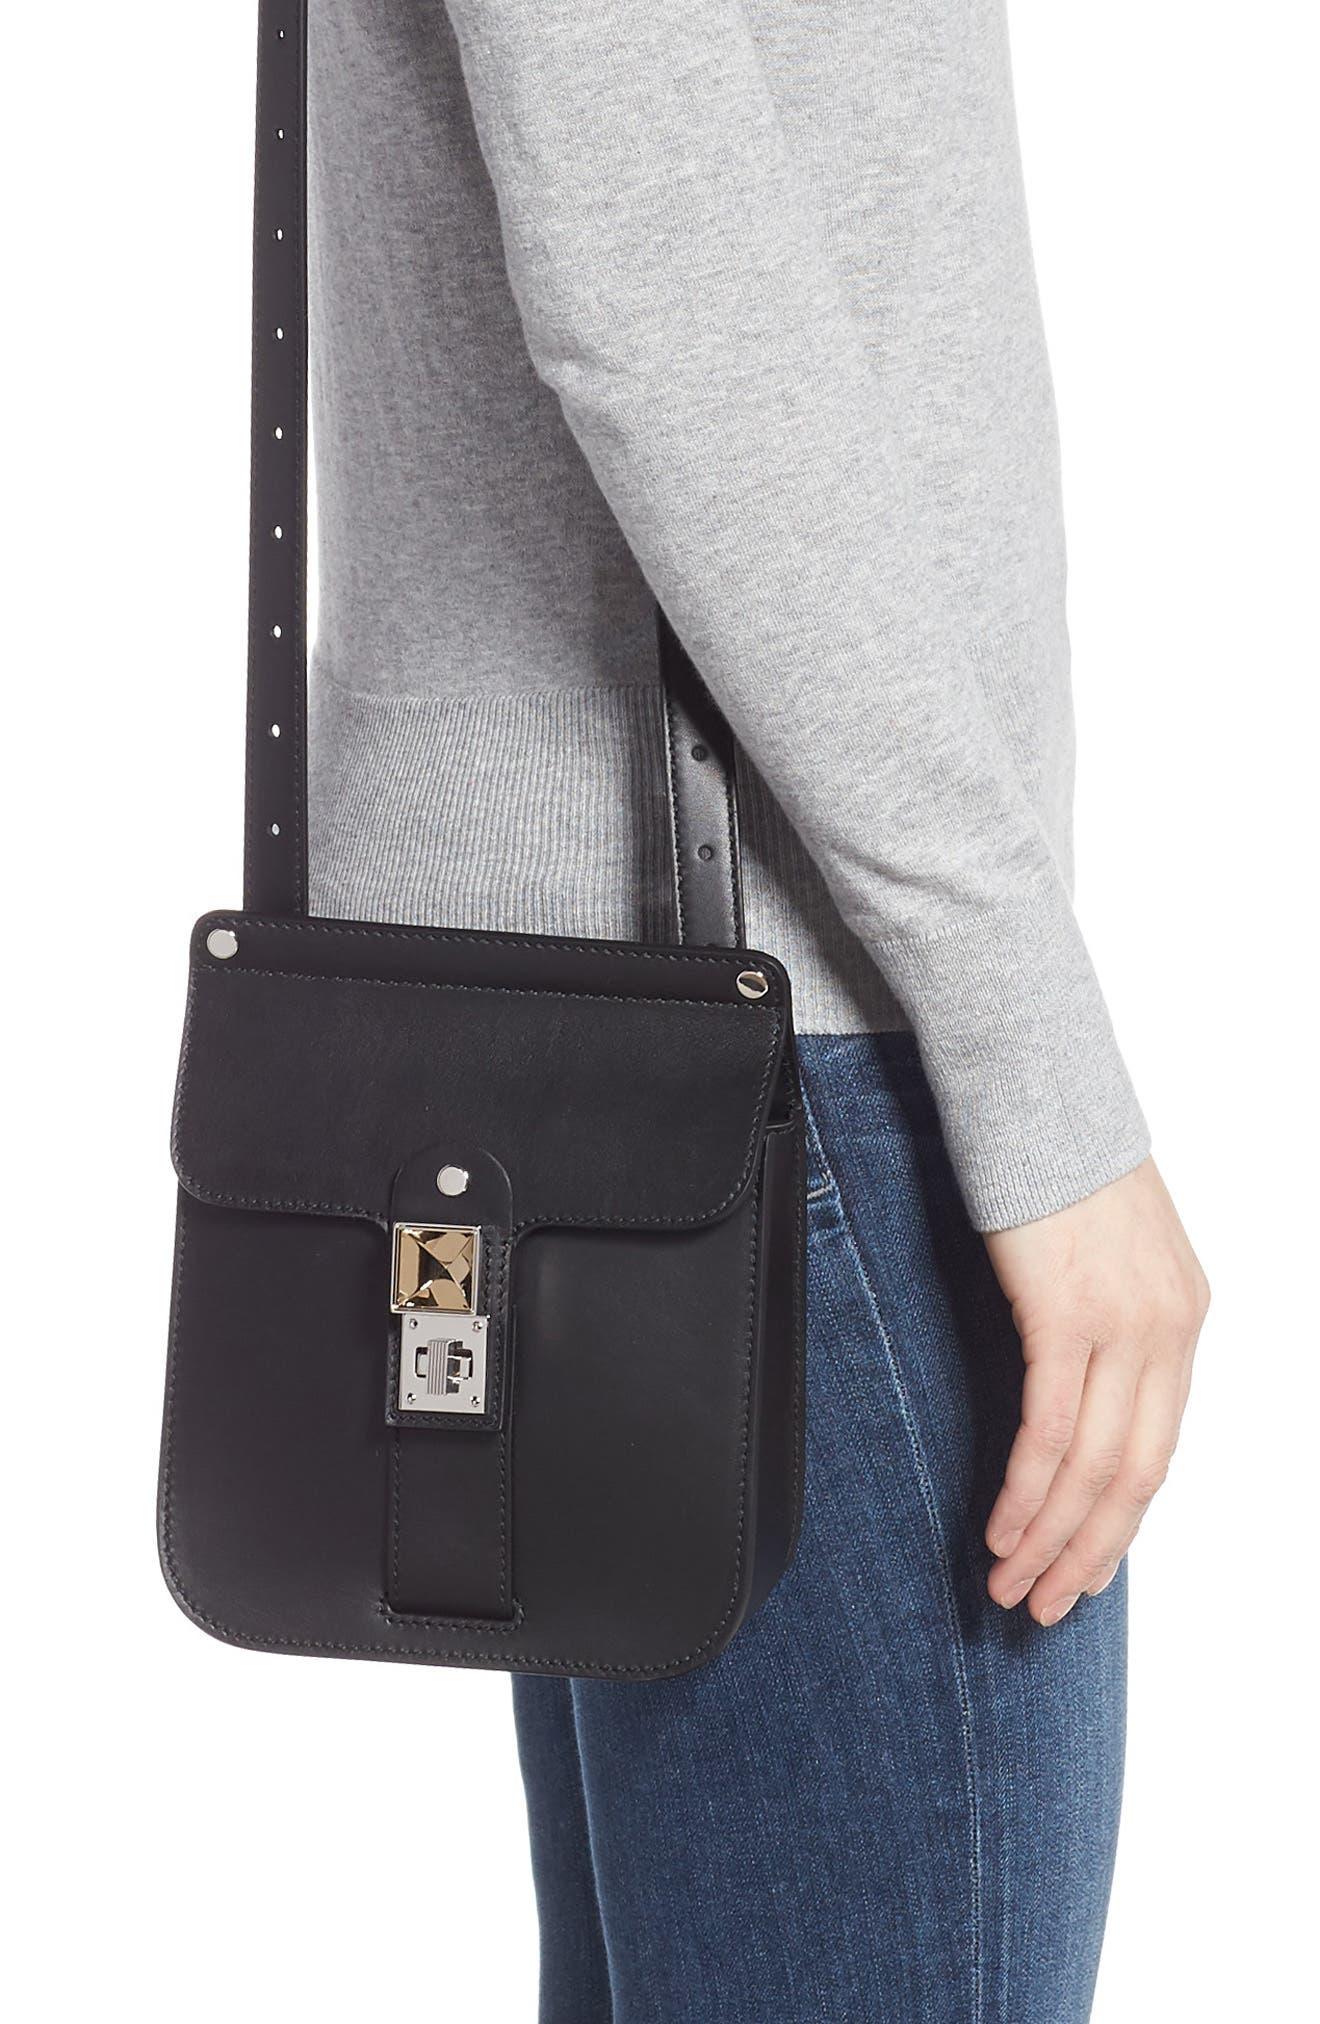 PROENZA SCHOULER, PS11 Box Leather Crossbody Bag, Alternate thumbnail 2, color, BLACK